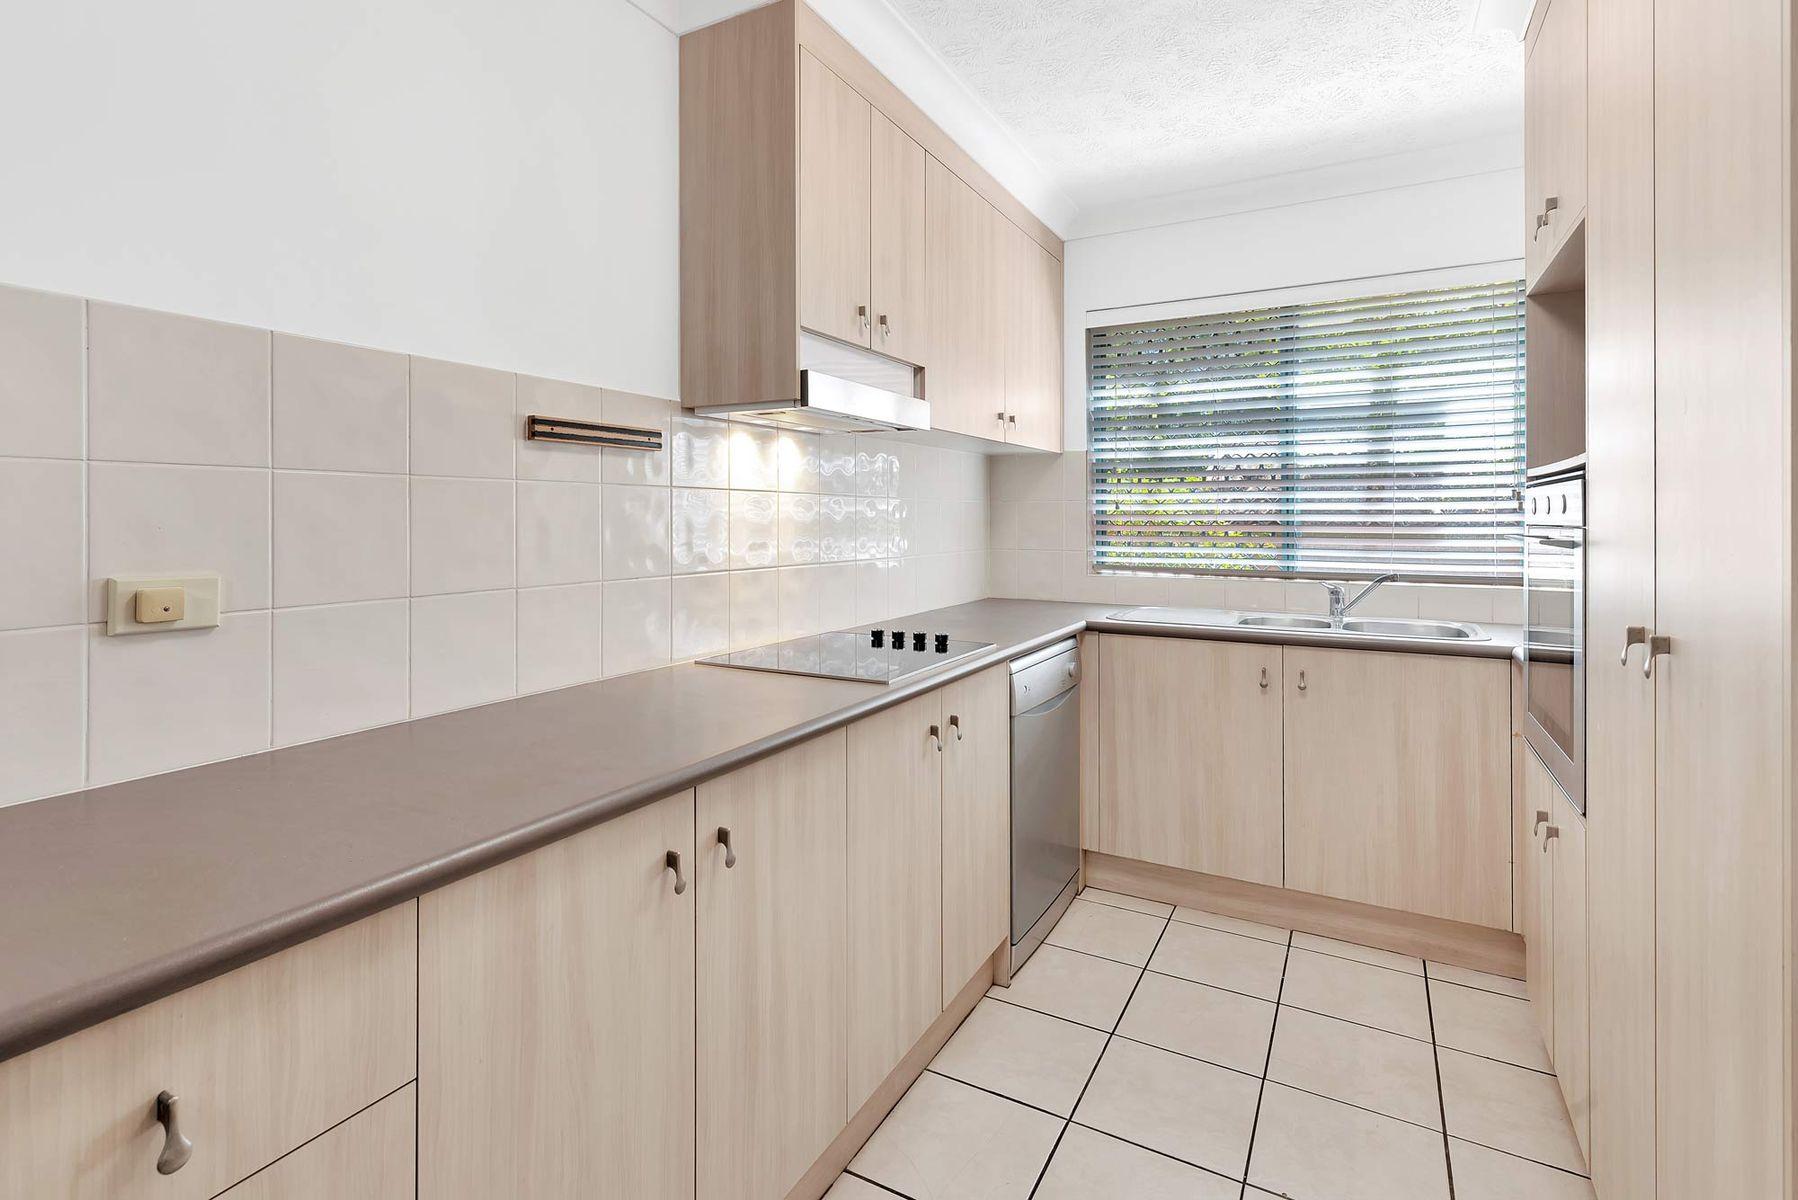 3/12 Gillian Lane, Southport, QLD 4215